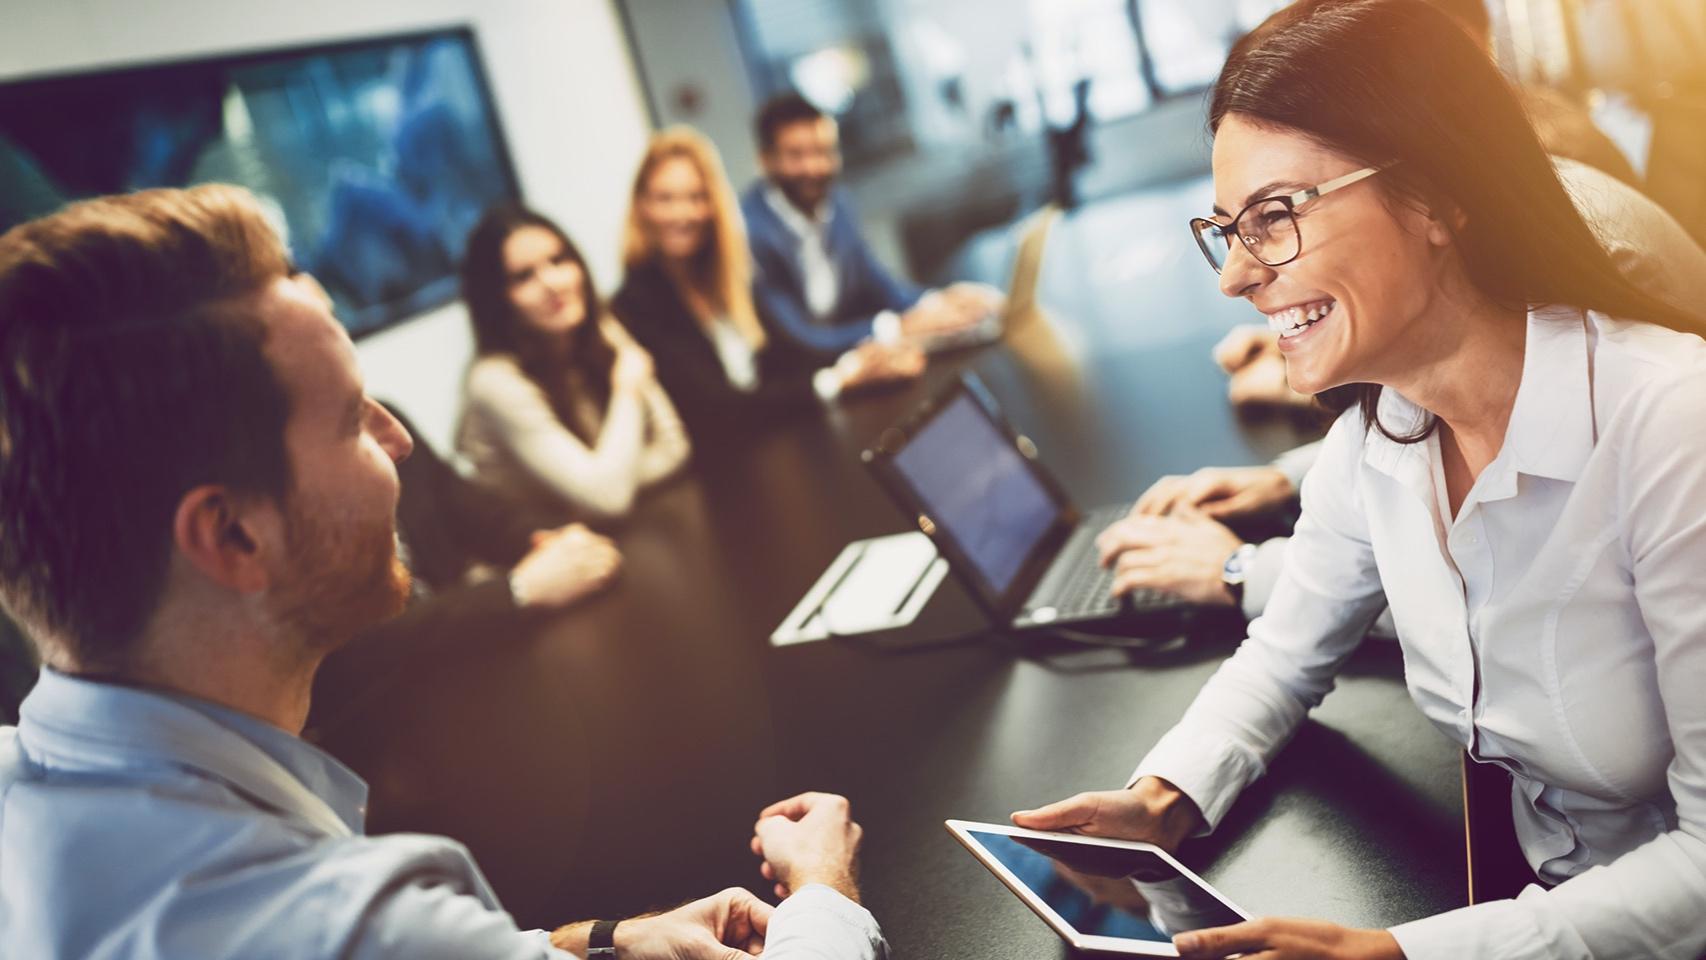 BlogPost_employee-productivity-meeting-room_01es.jpg